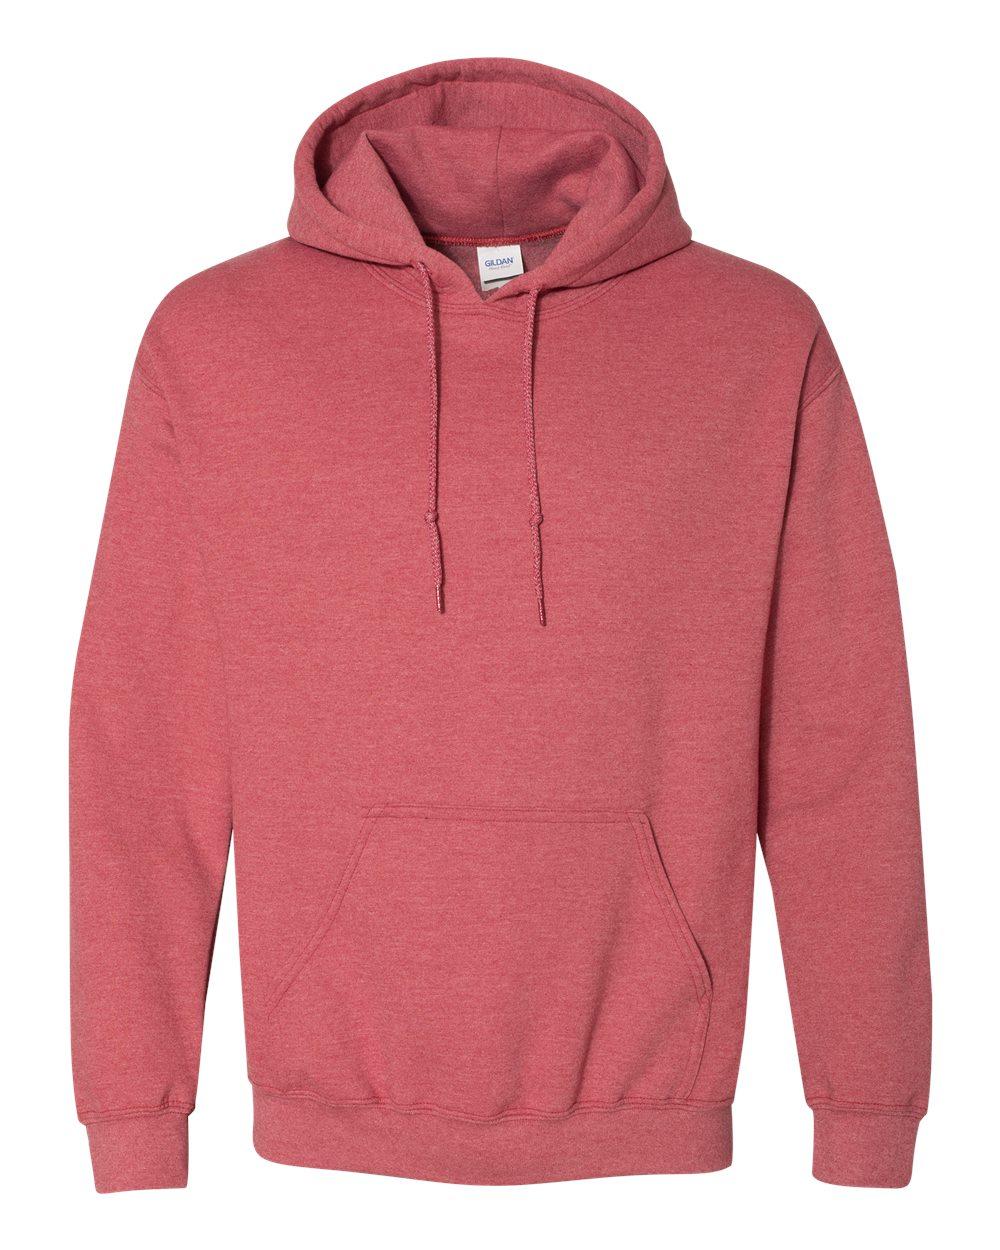 Gildan-Mens-Blank-Hoodie-Heavy-Blend-Hooded-Sweatshirt-18500-up-to-5XL thumbnail 33